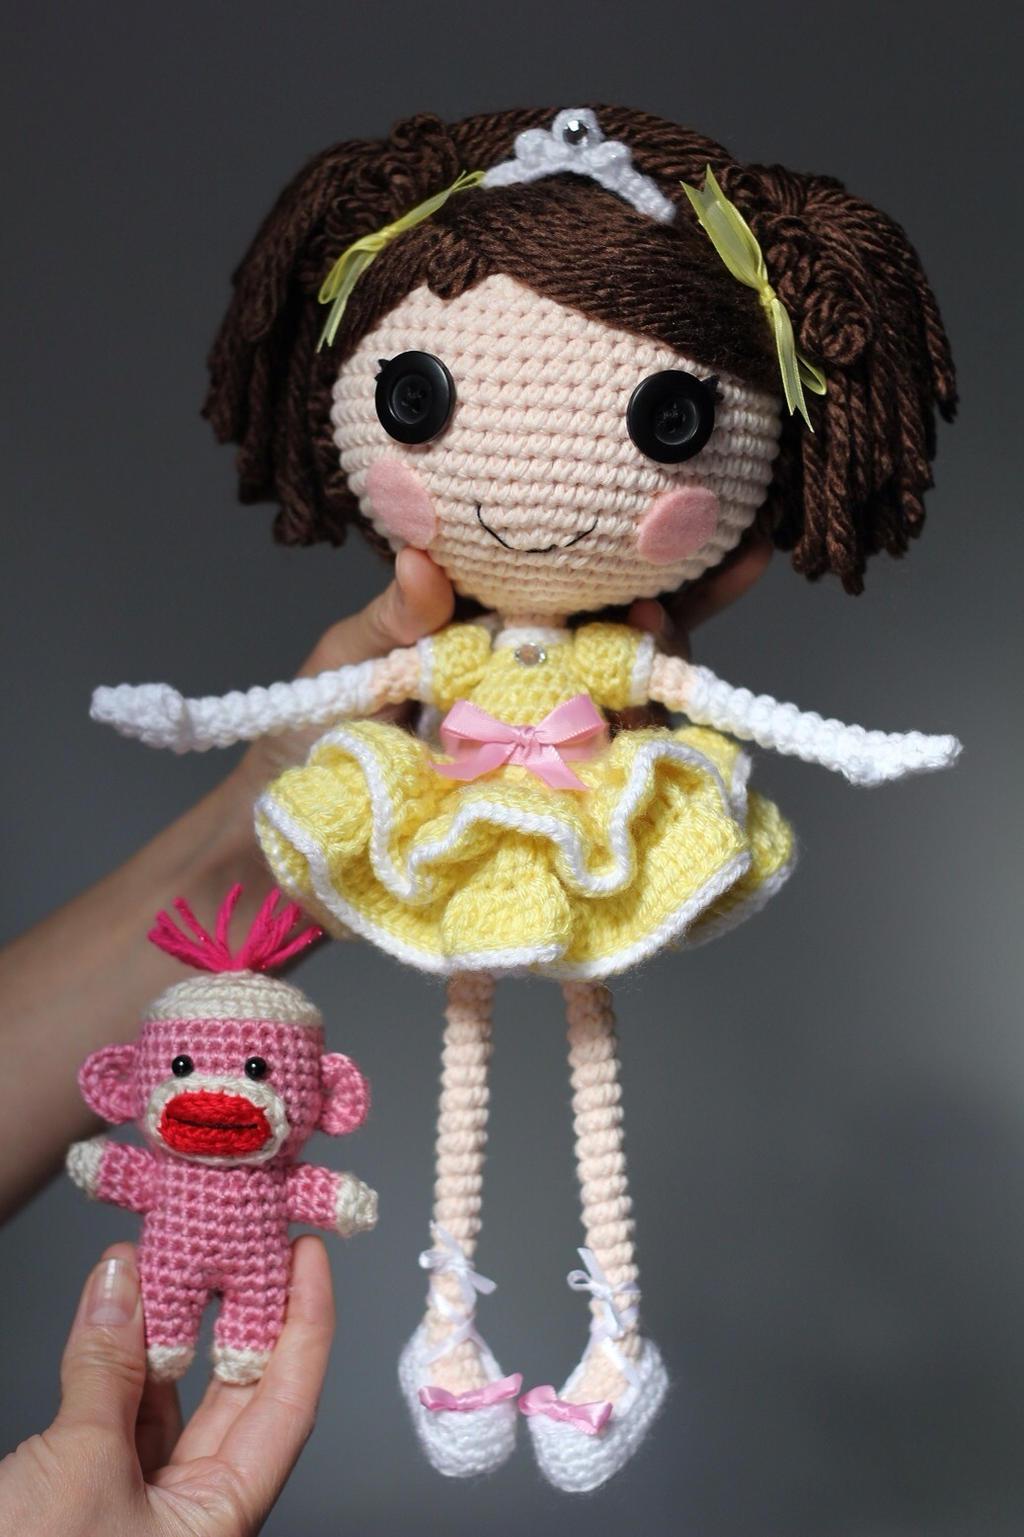 Sock Monkey Amigurumi Pattern : LALALOOPSY OC Crochet Amigurumi Doll by Npantz22 on DeviantArt